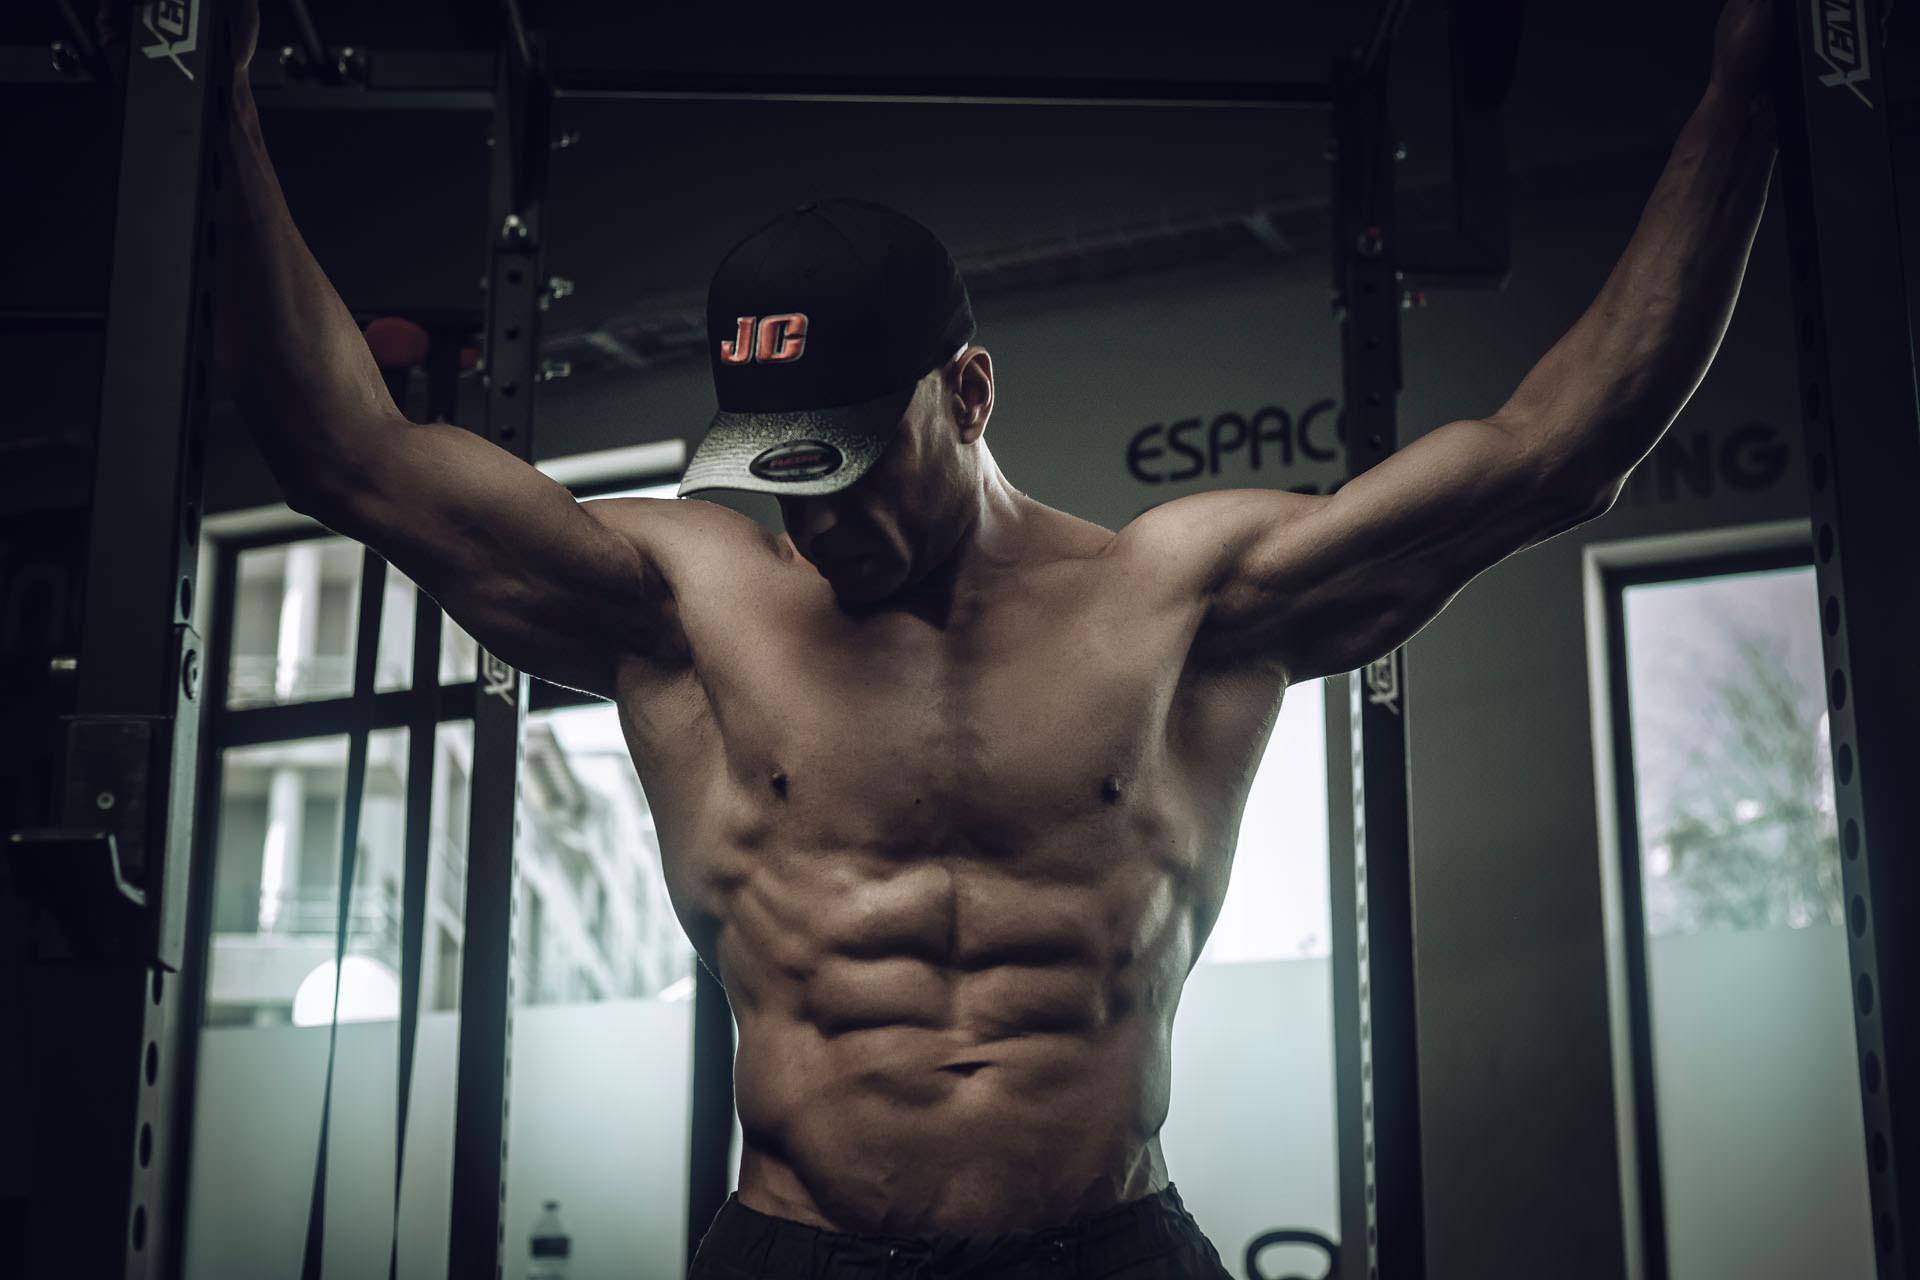 2017-02-24 - Jamo Nezzar - MyMuscle - FitnessPark - 4550 - 1920px